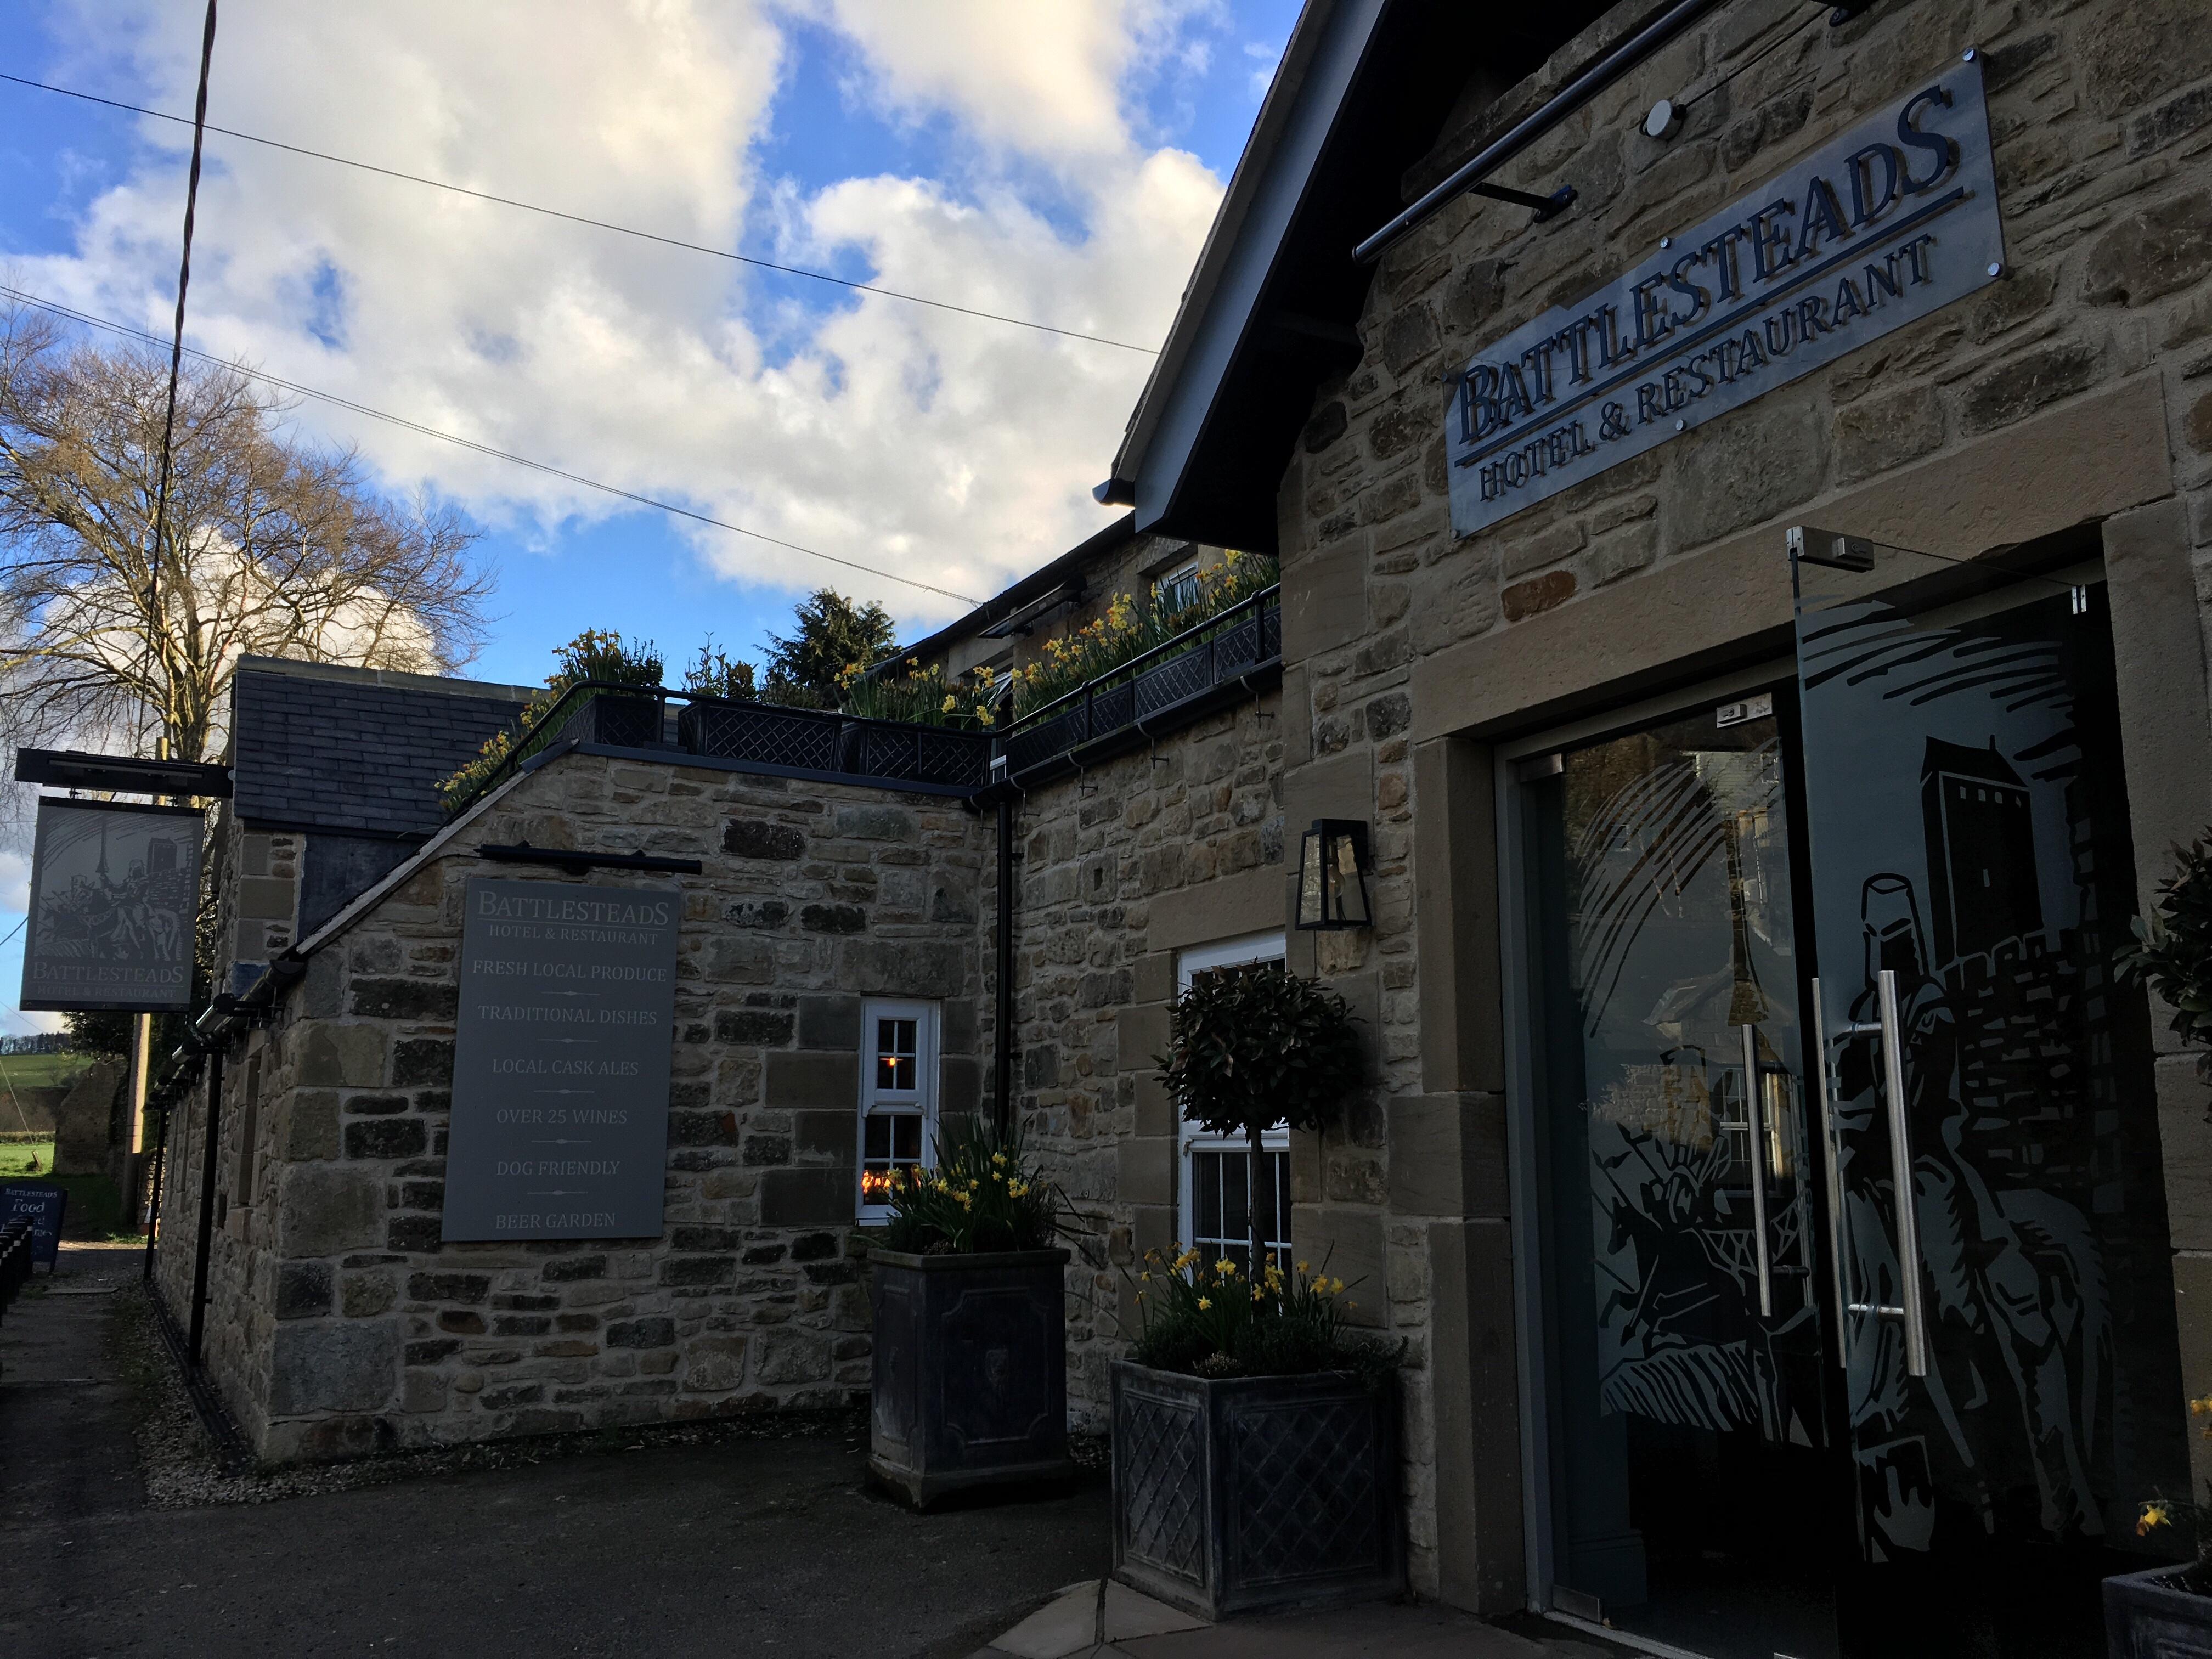 Battlesteads Hotel and Restaurant